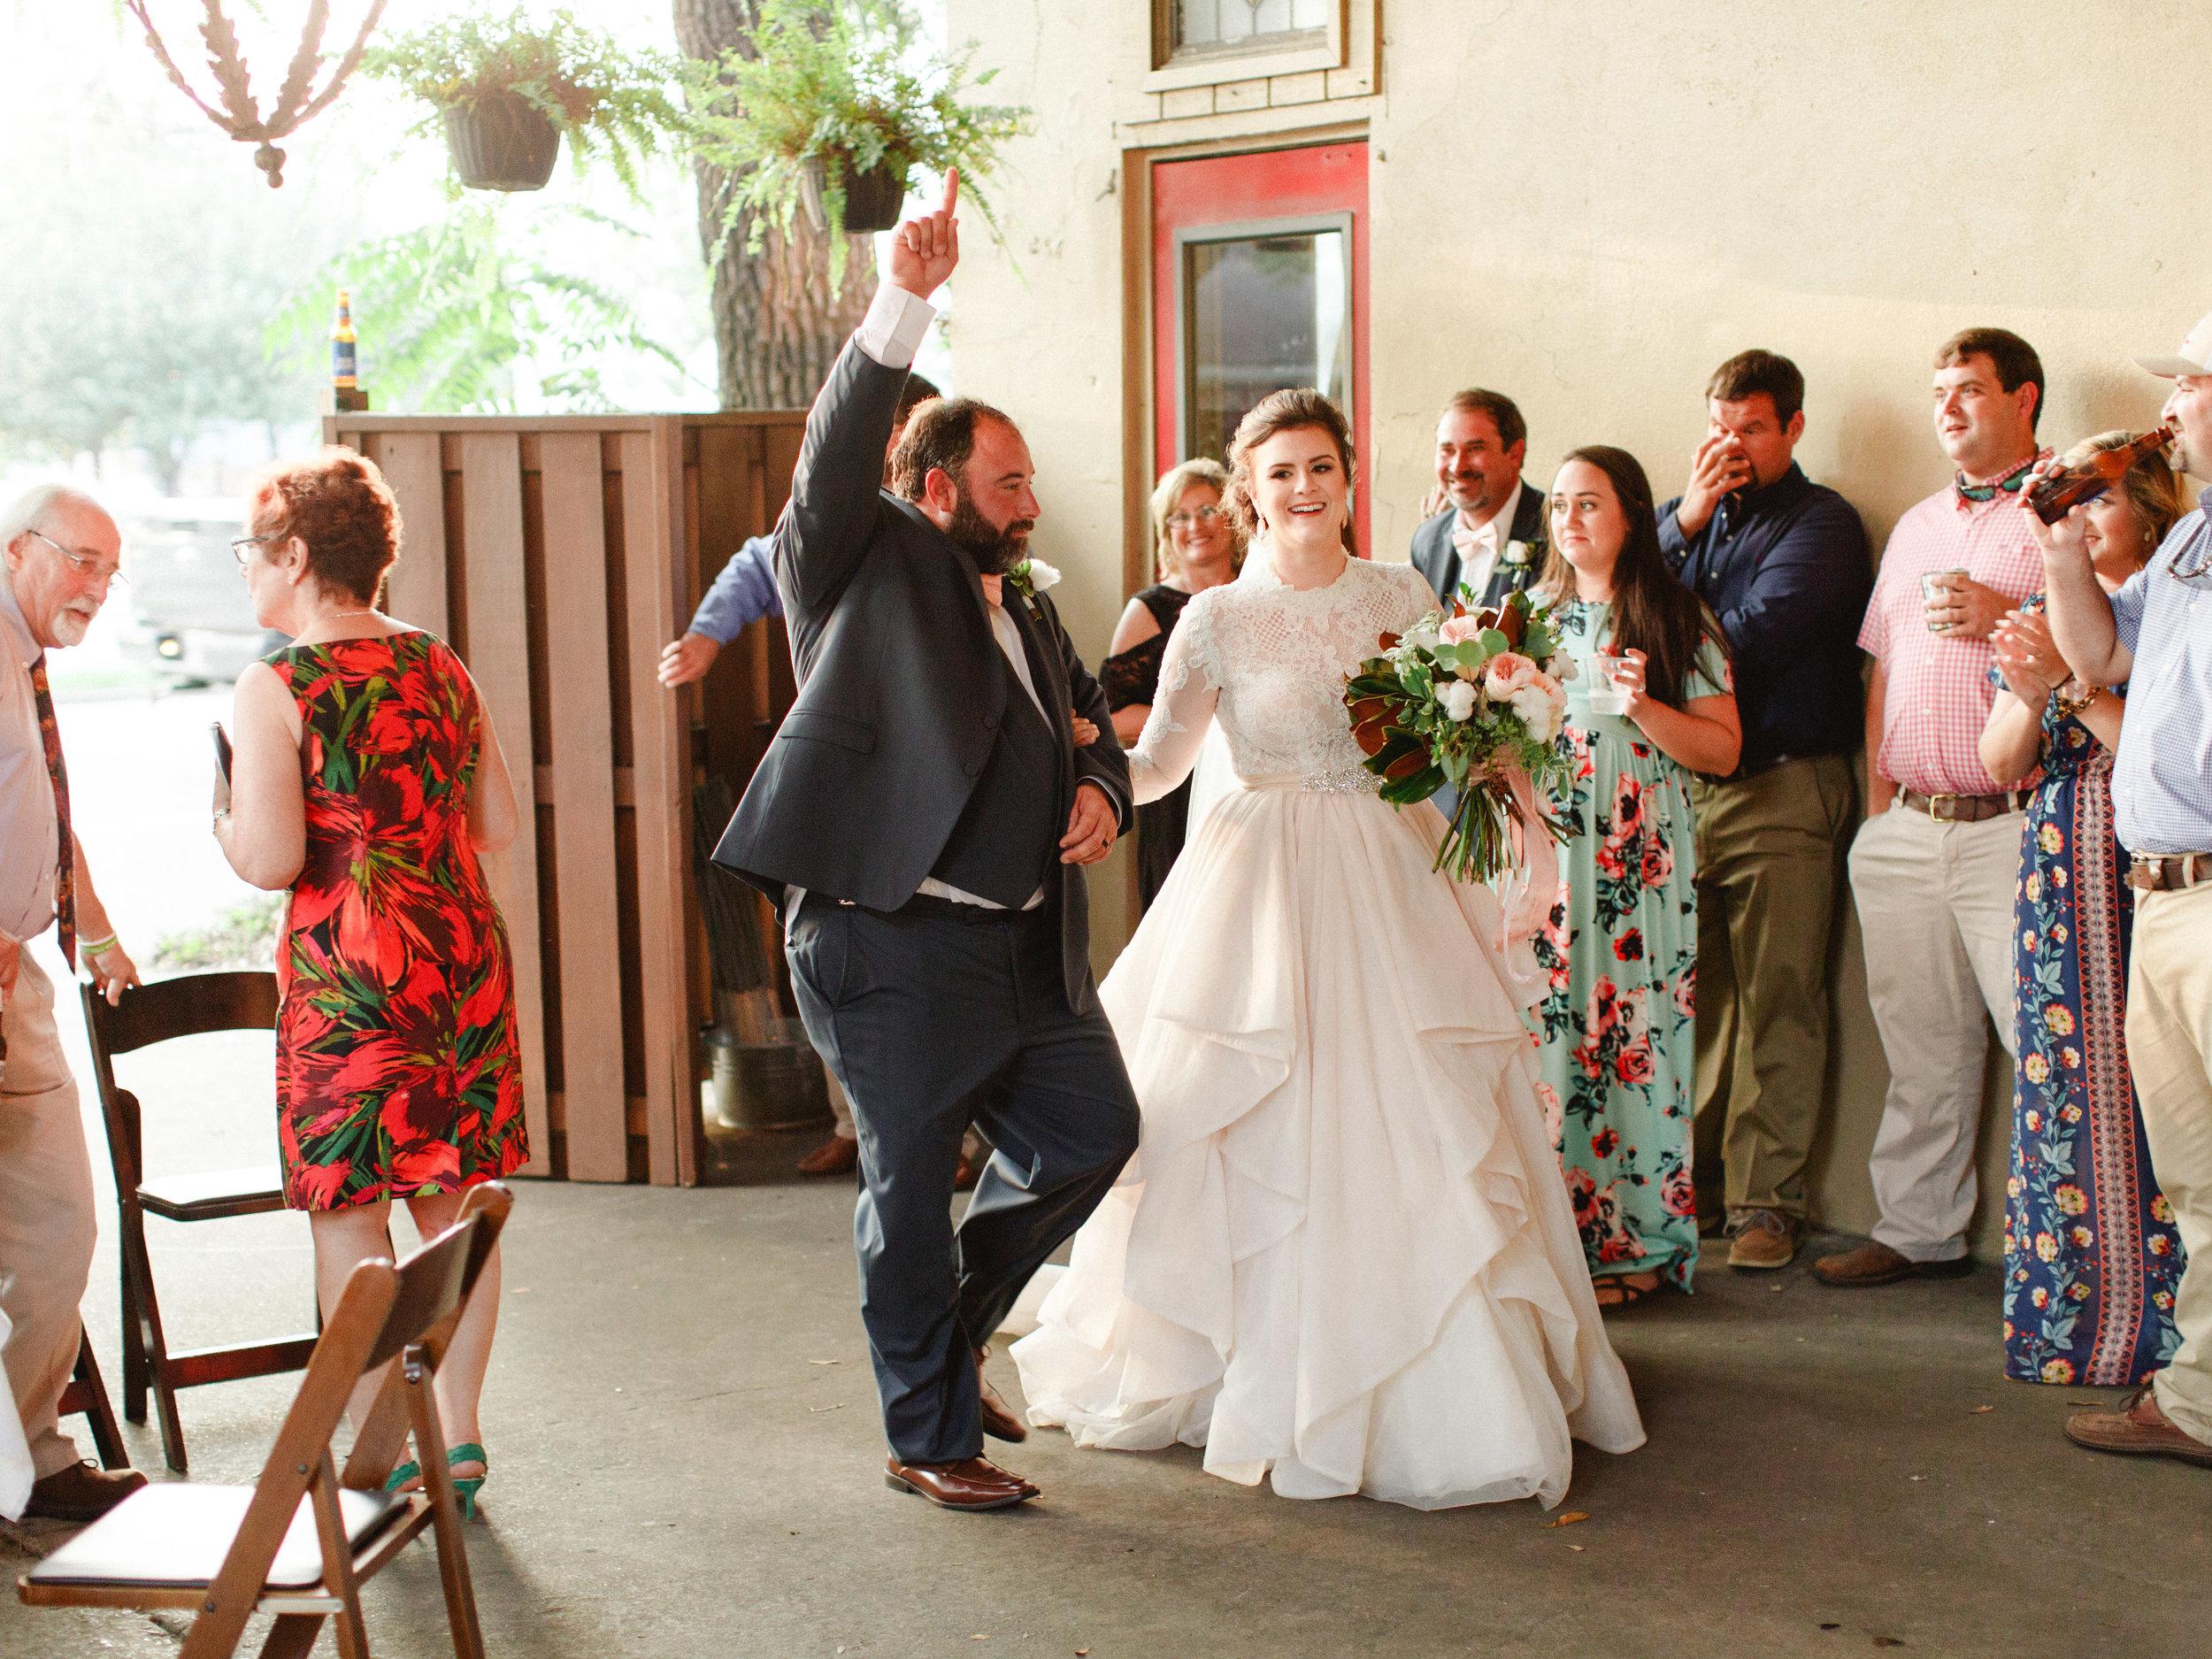 savannah-cha-bella-wedding-32.jpg